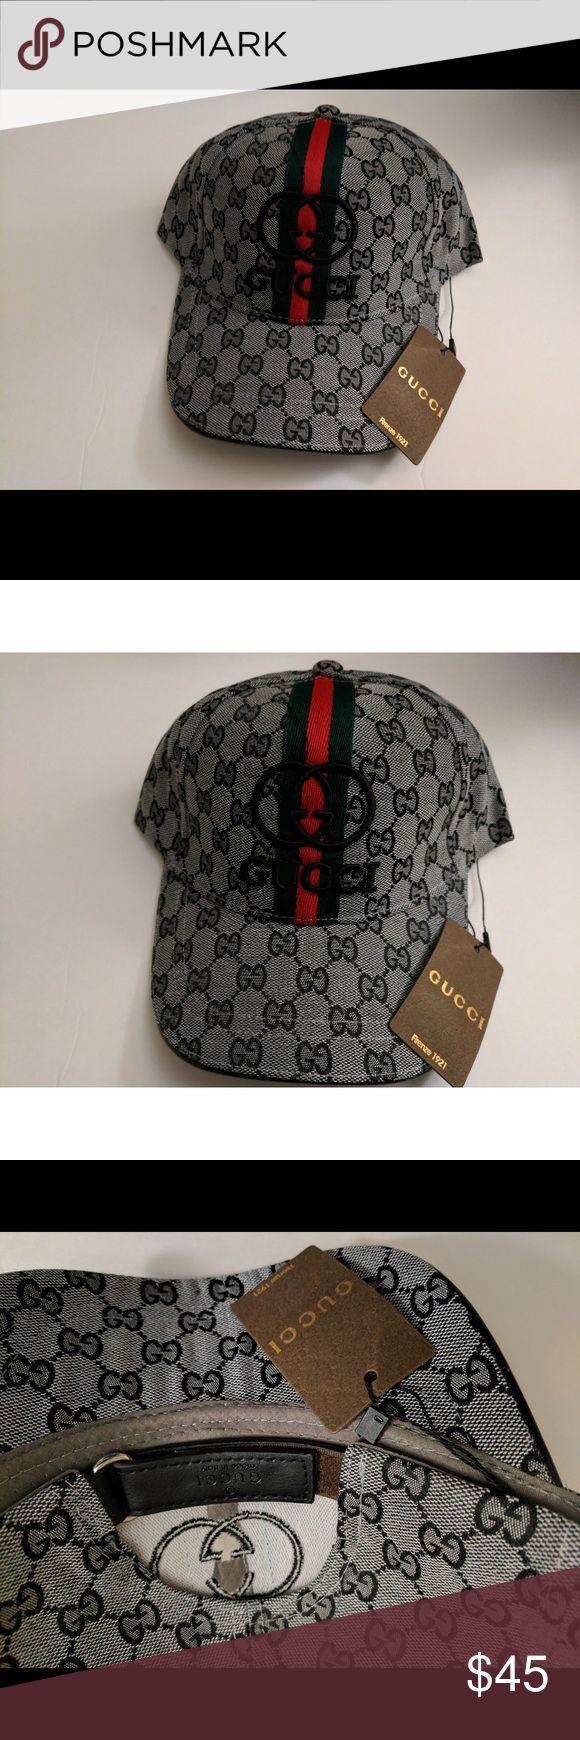 Gucci Style Designer Baseball Hat Popular Gucci designer style baseball hats. Classic hat! Accessories Hats